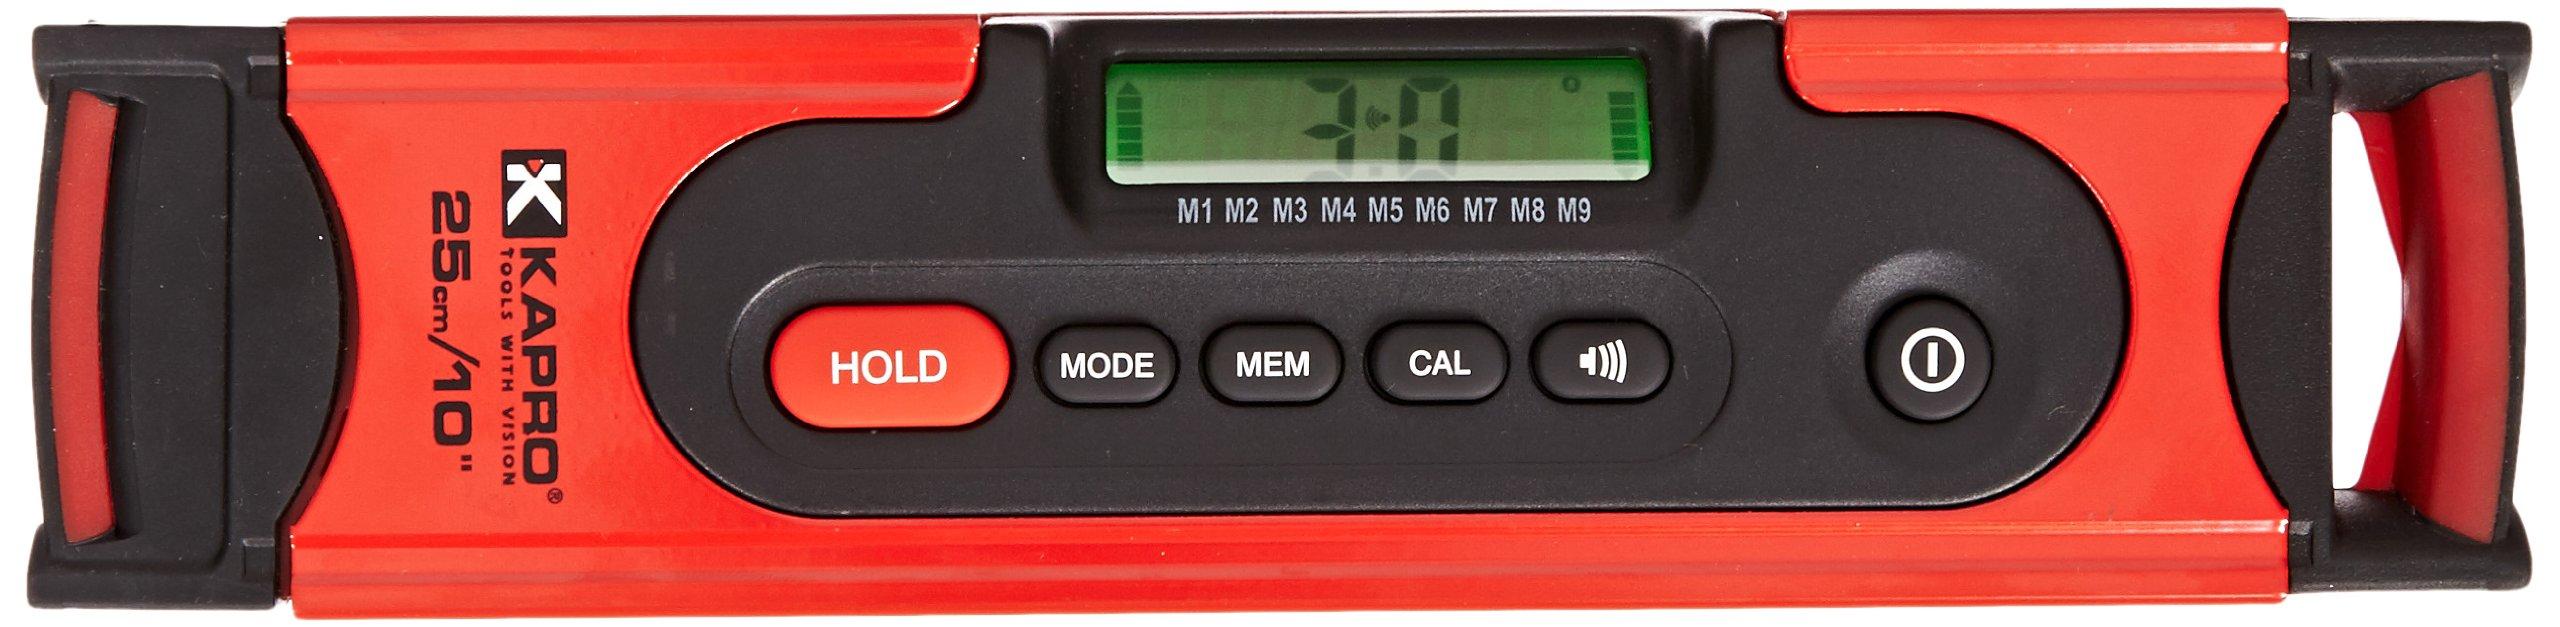 Kapro 985D-10 Digiman Professional Digital Level, 10-Inch